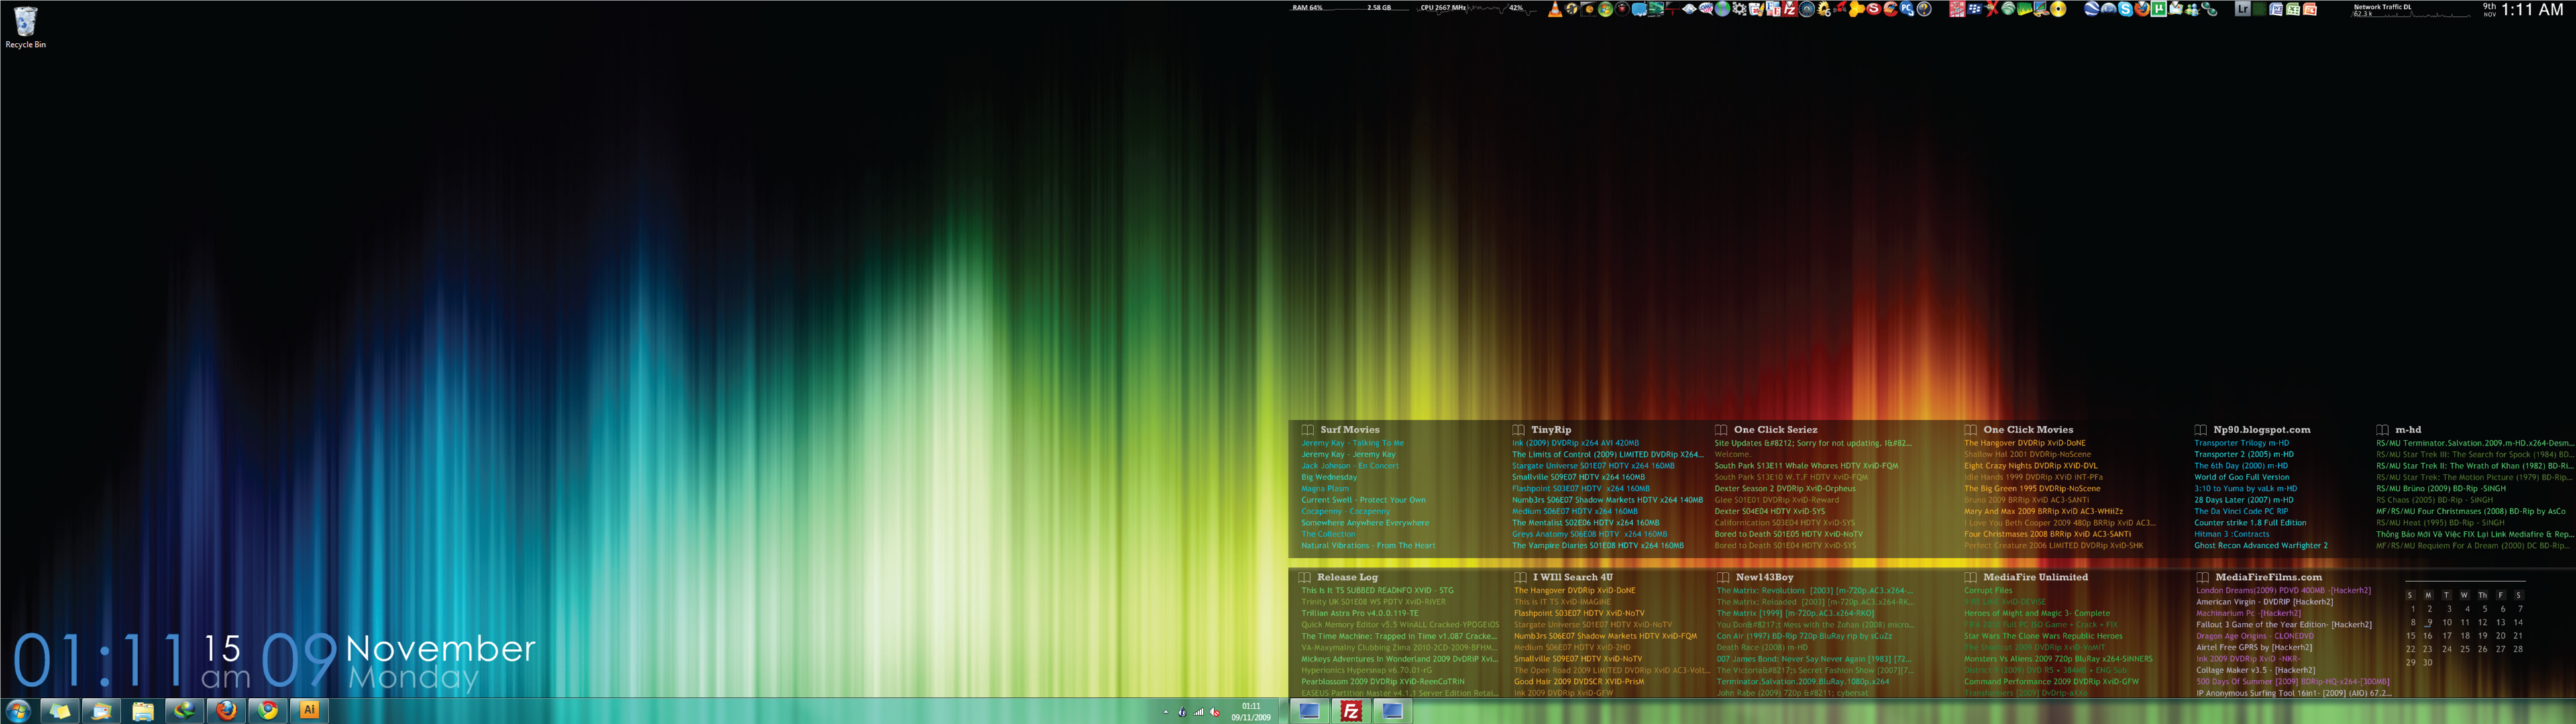 Dual Screen Desktop Windows 7 By Bengatley